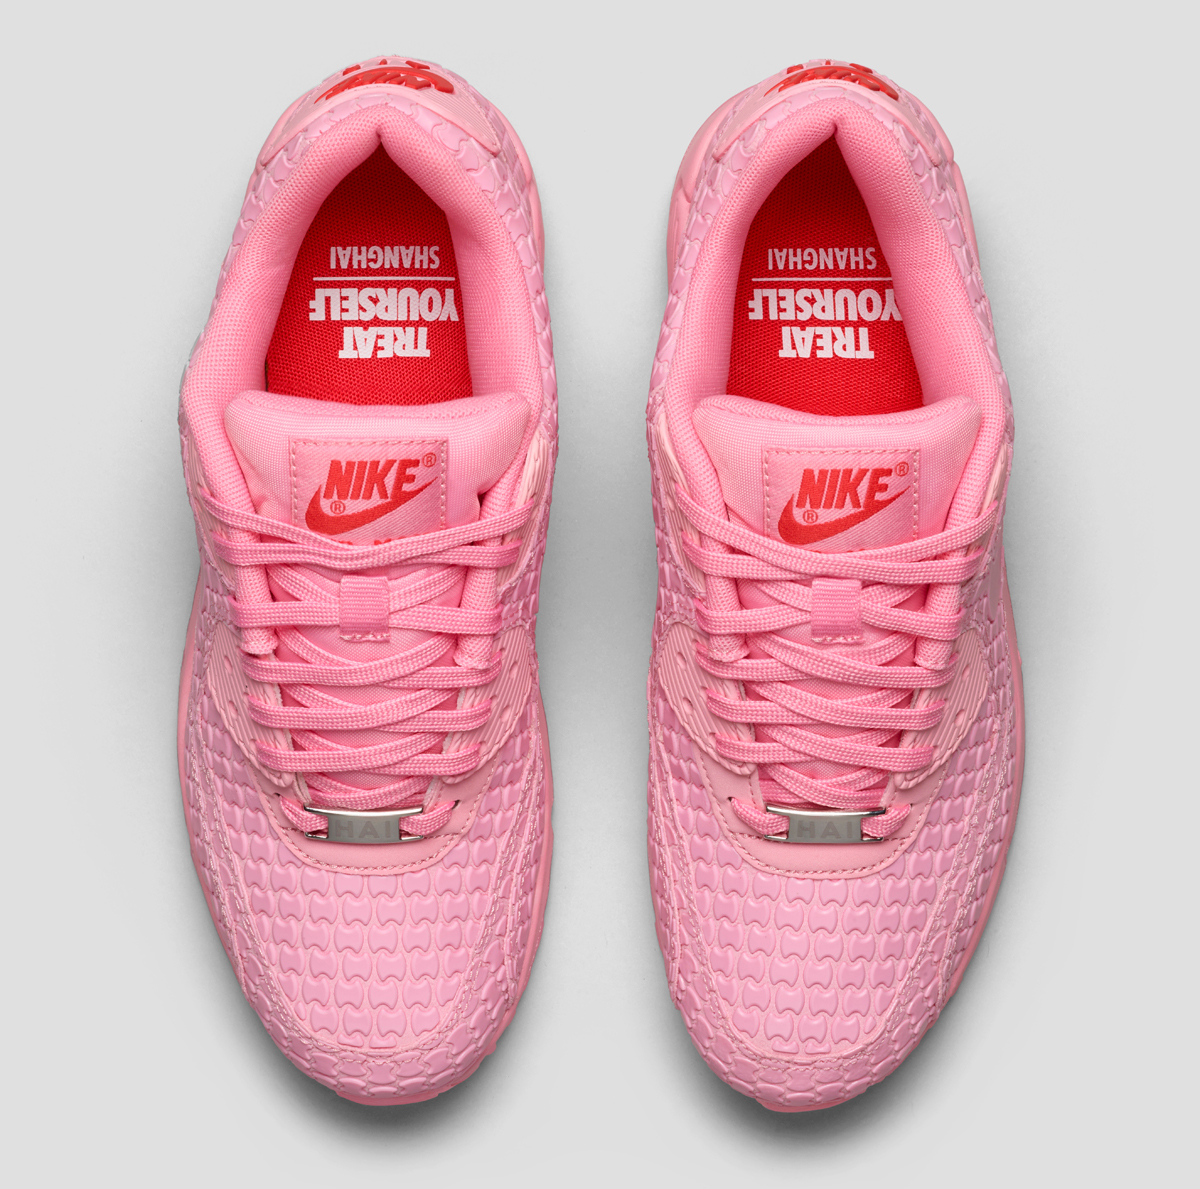 nike air max 90 shanghai womens shoe $170 pesos